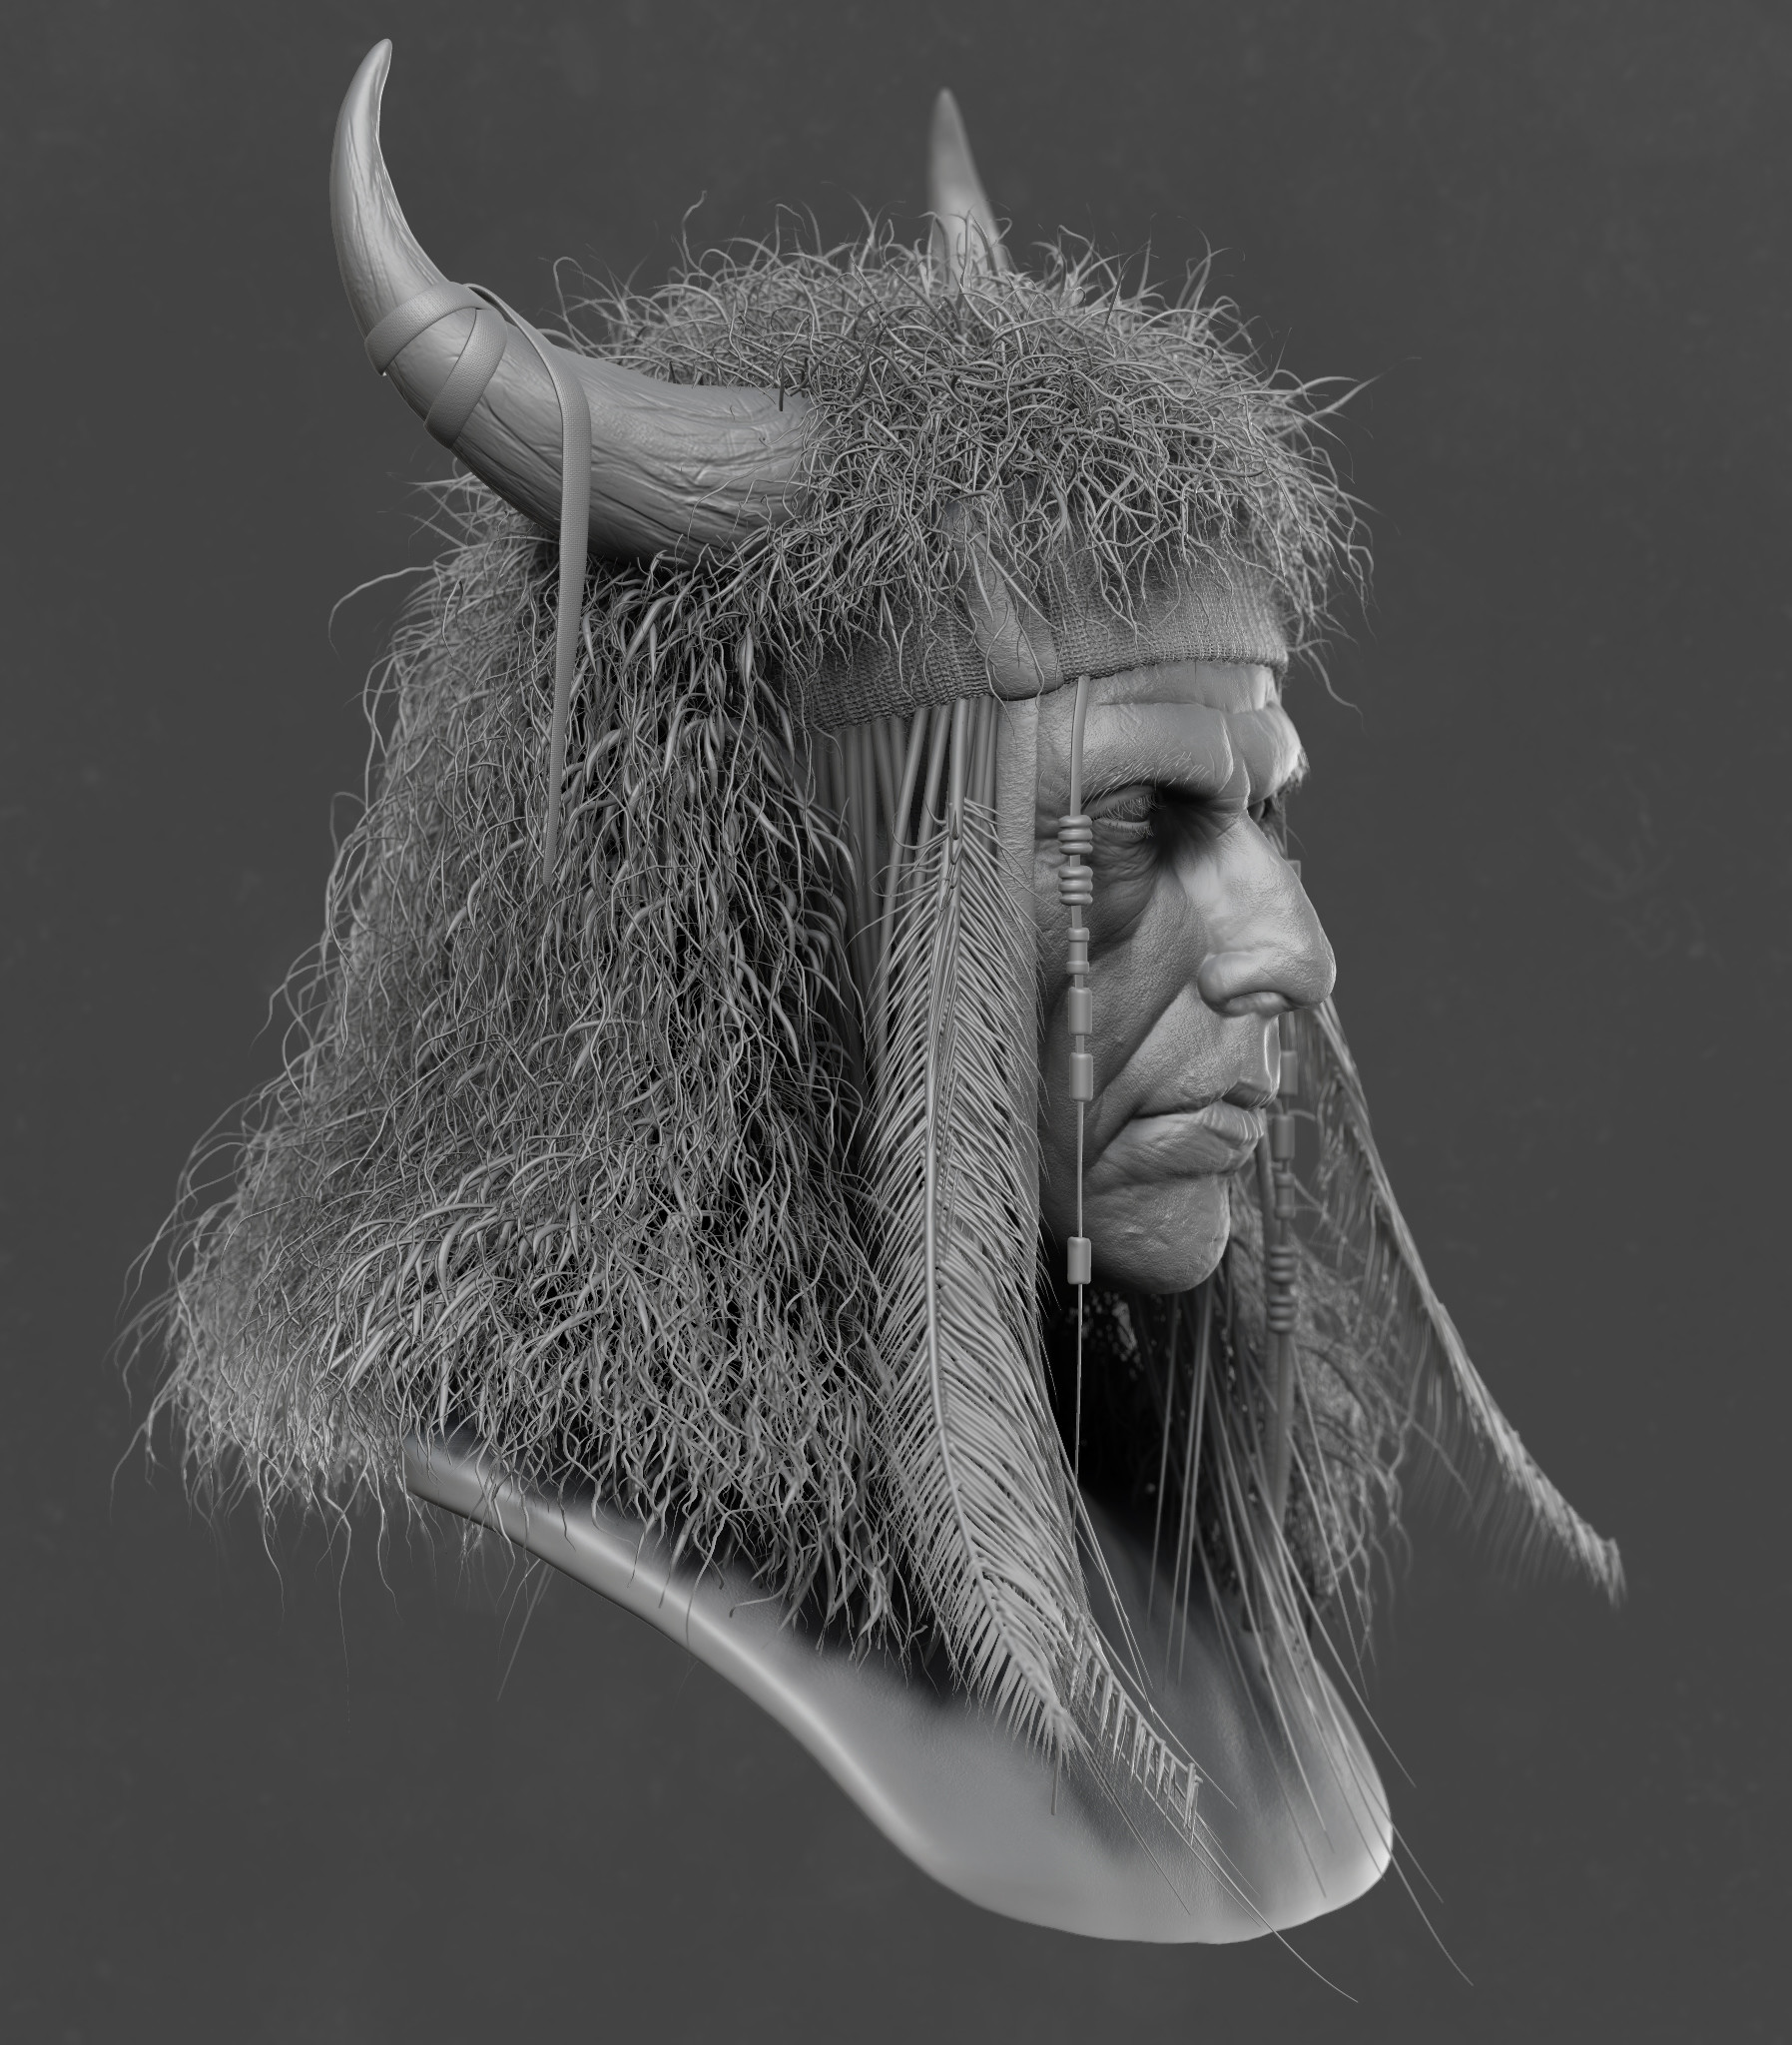 Hugues thibodeau htib nativeamerican side a